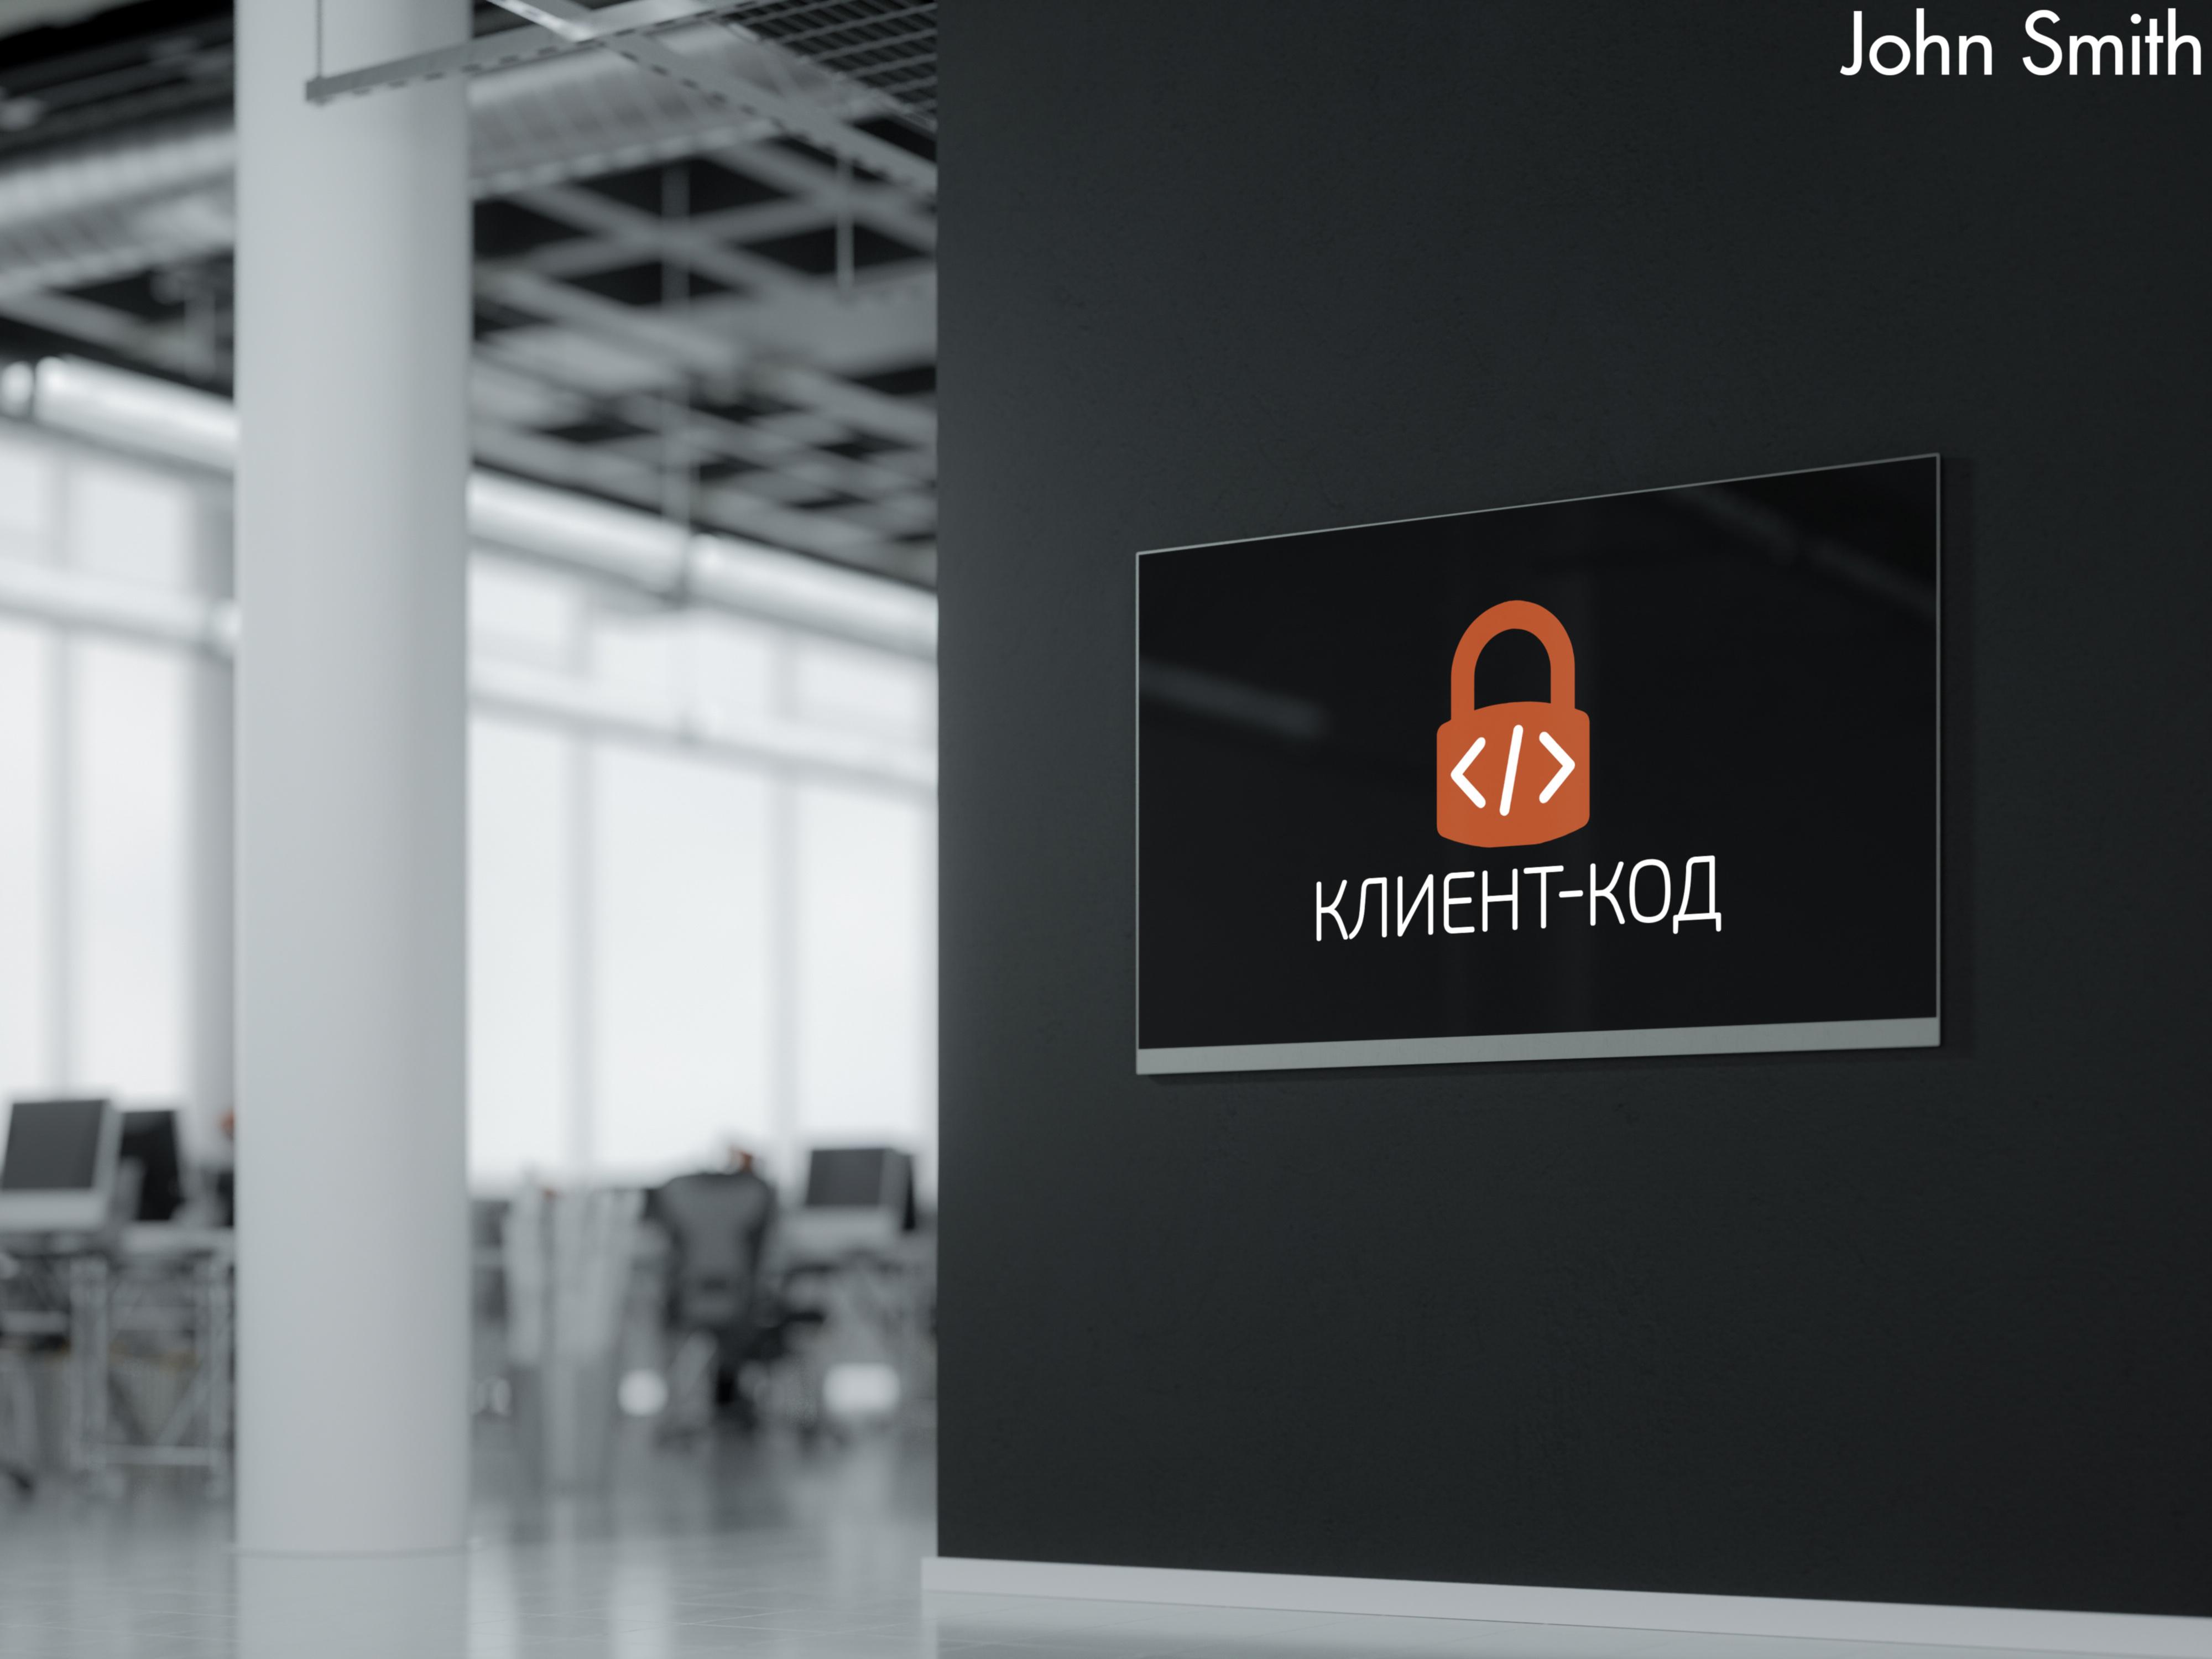 Нейминг и логотип компании, занимающейся аутсорсингом фото f_27159d68abab9f39.jpg